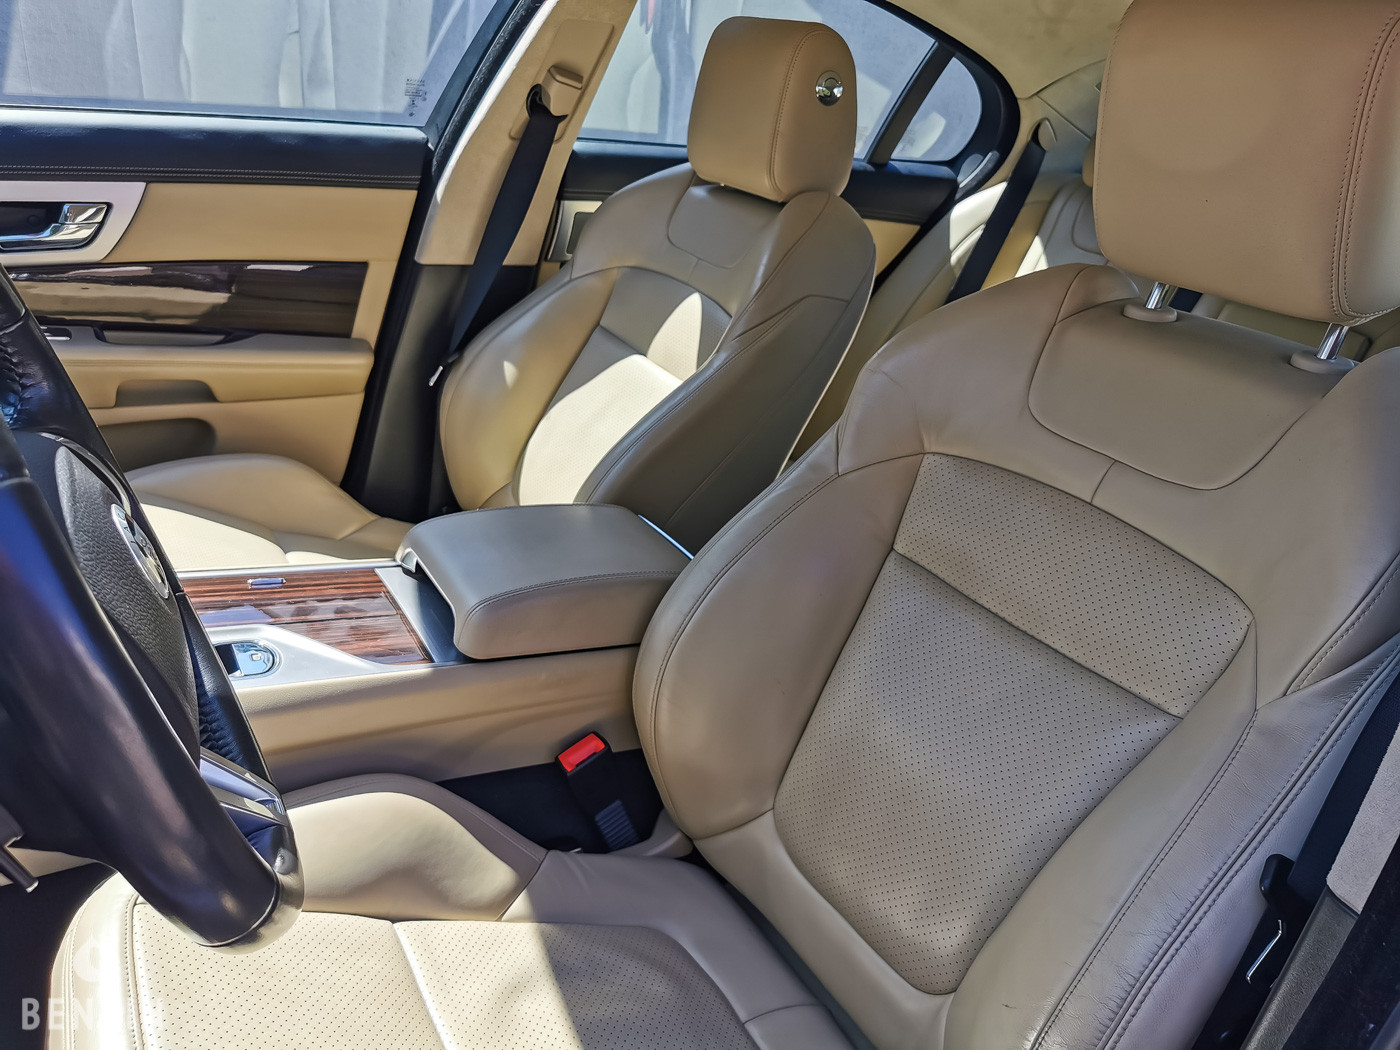 Jaguar XF 3.0 V6 340 Portfolio occasion à vendre se vende for sale zu verkaufen te koop